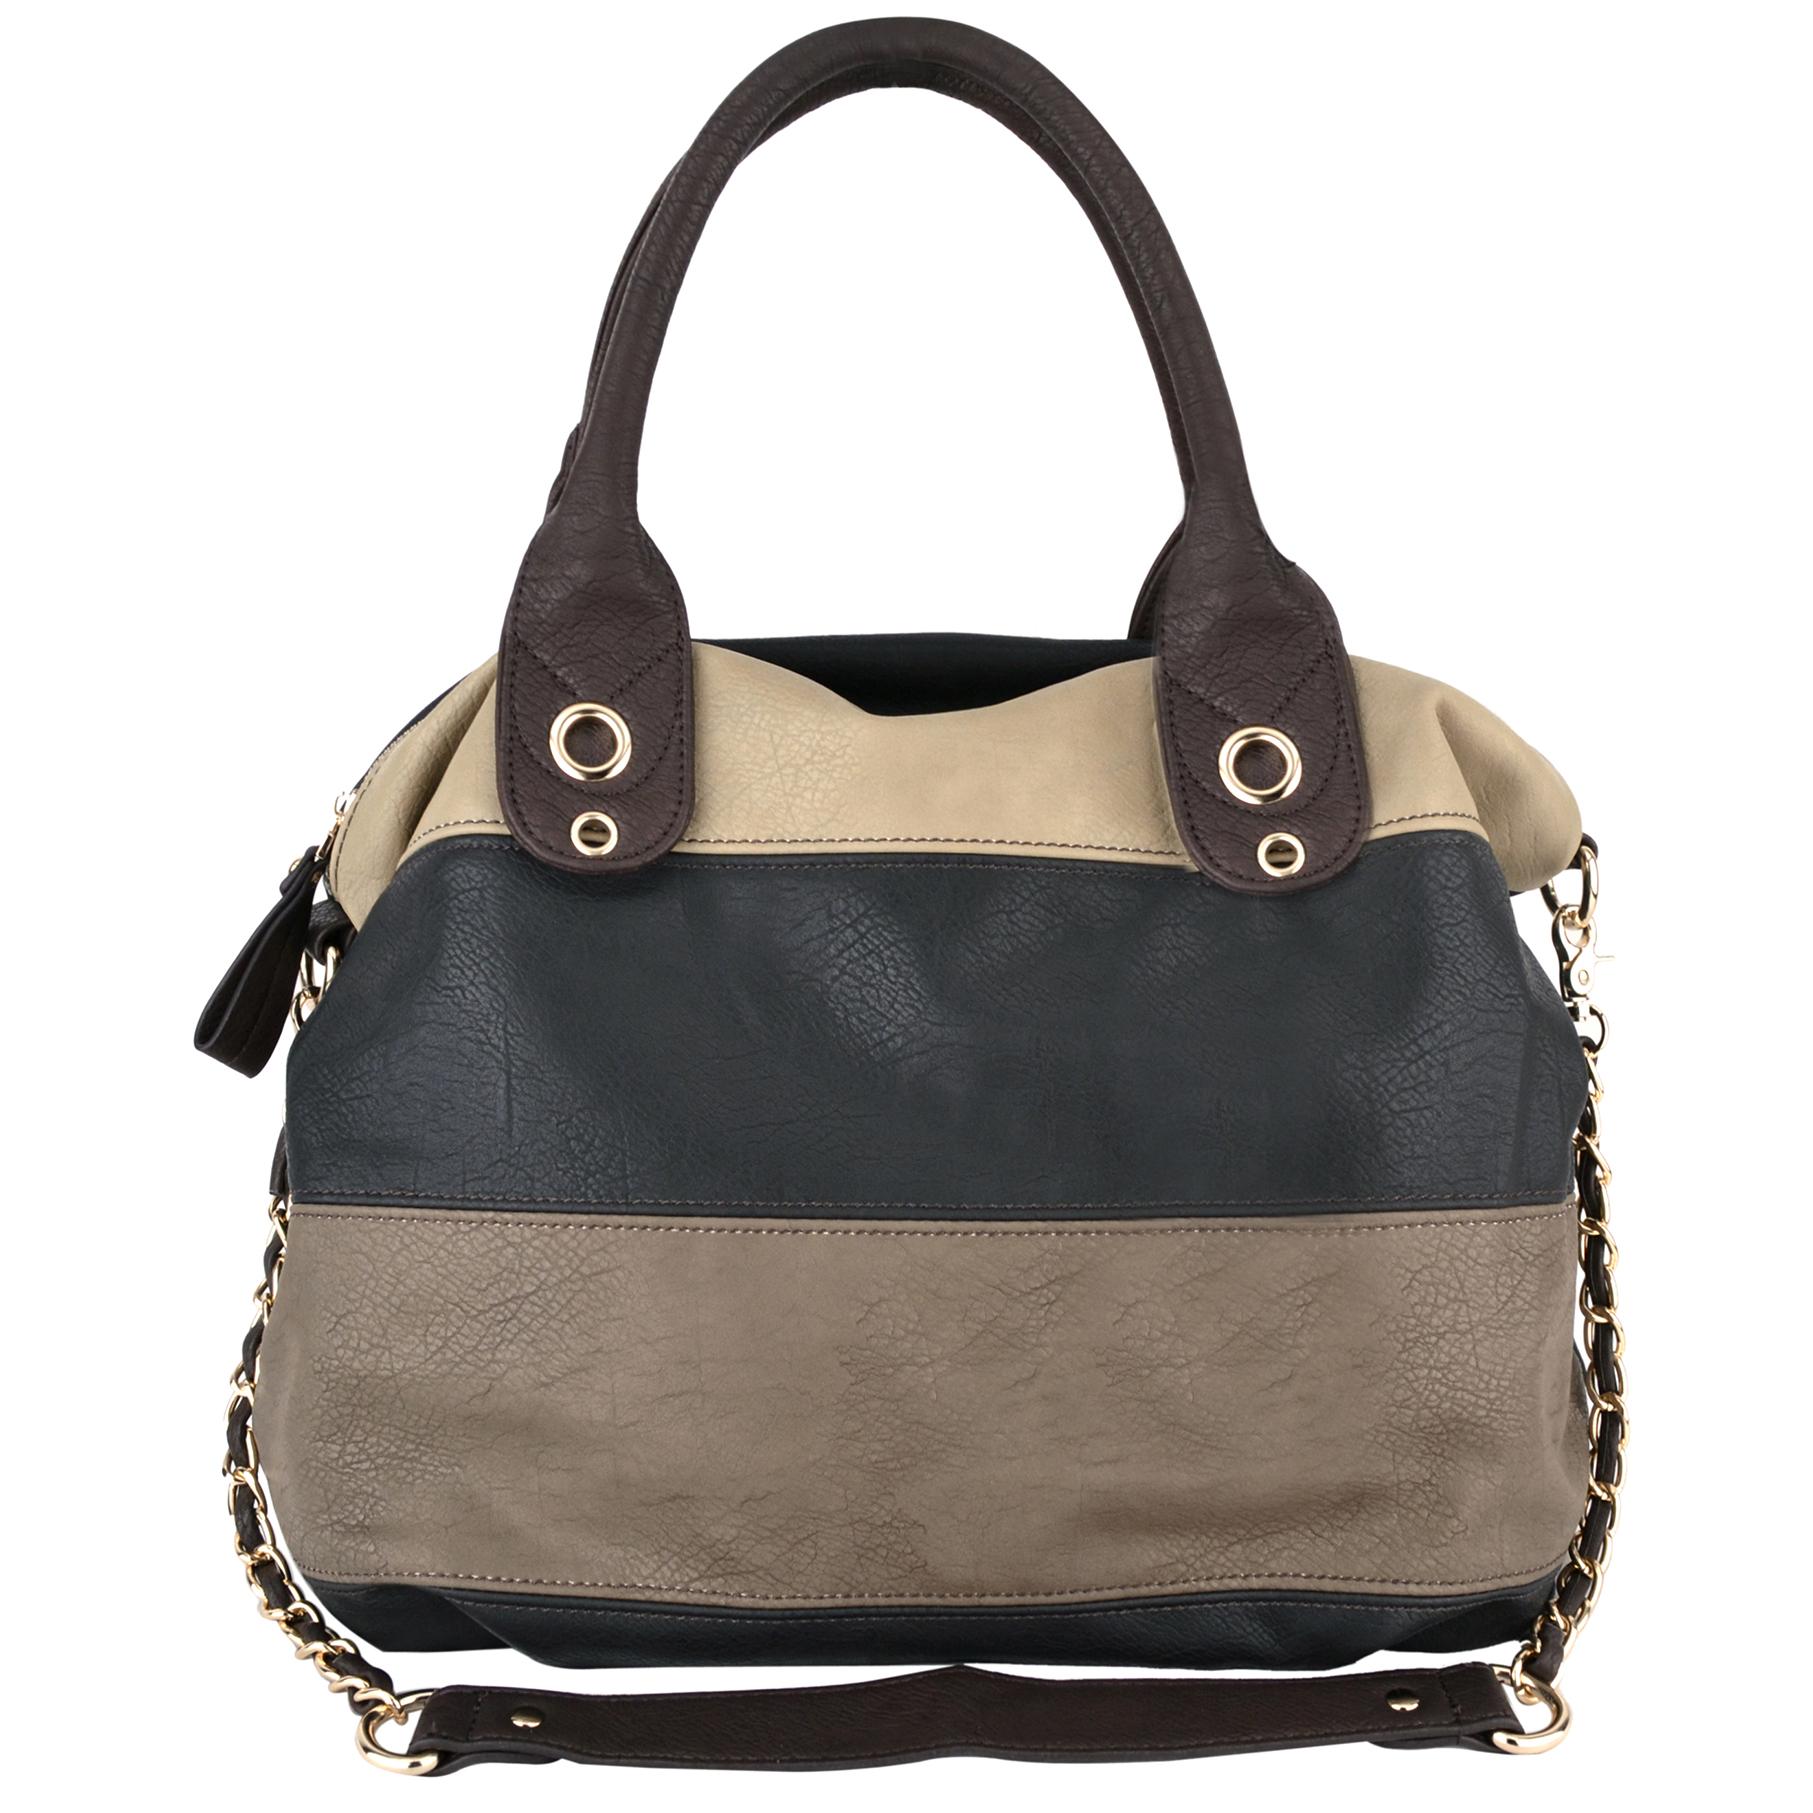 MAYA Black Large Shopper Hobo Handbag Front